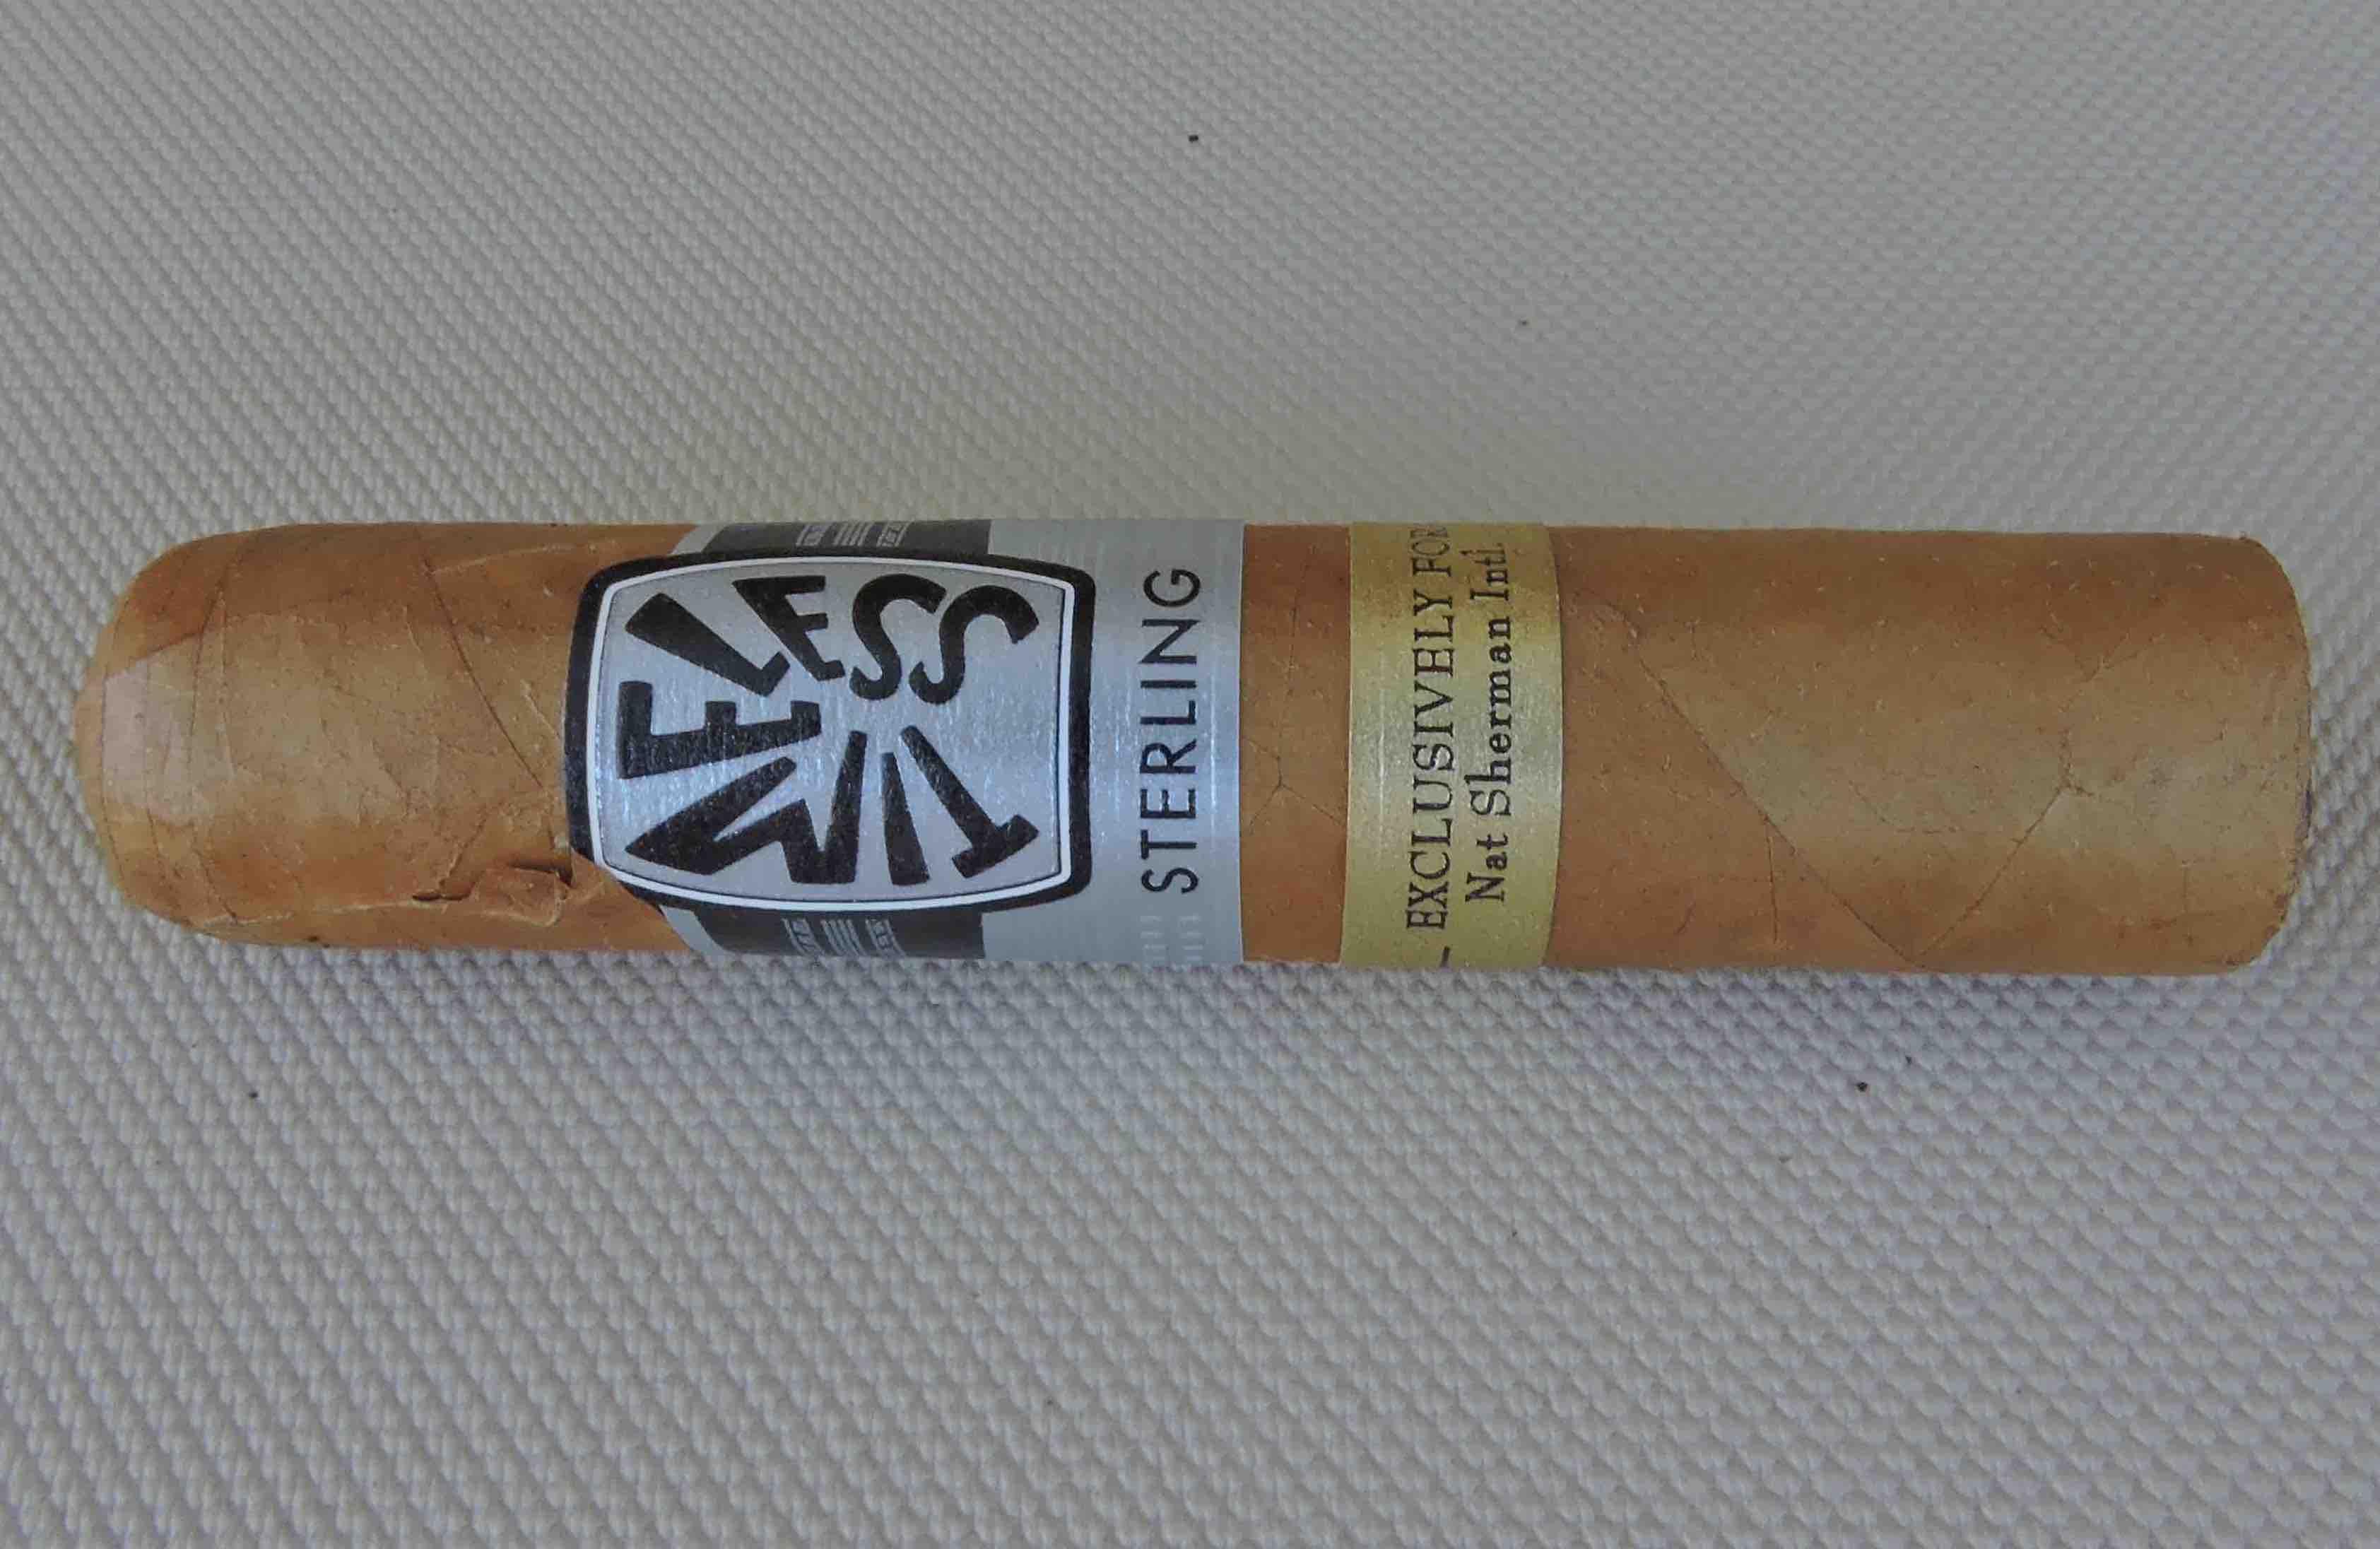 Agile Cigar Review: Nat Sherman Timeless Sterling Short Robusto